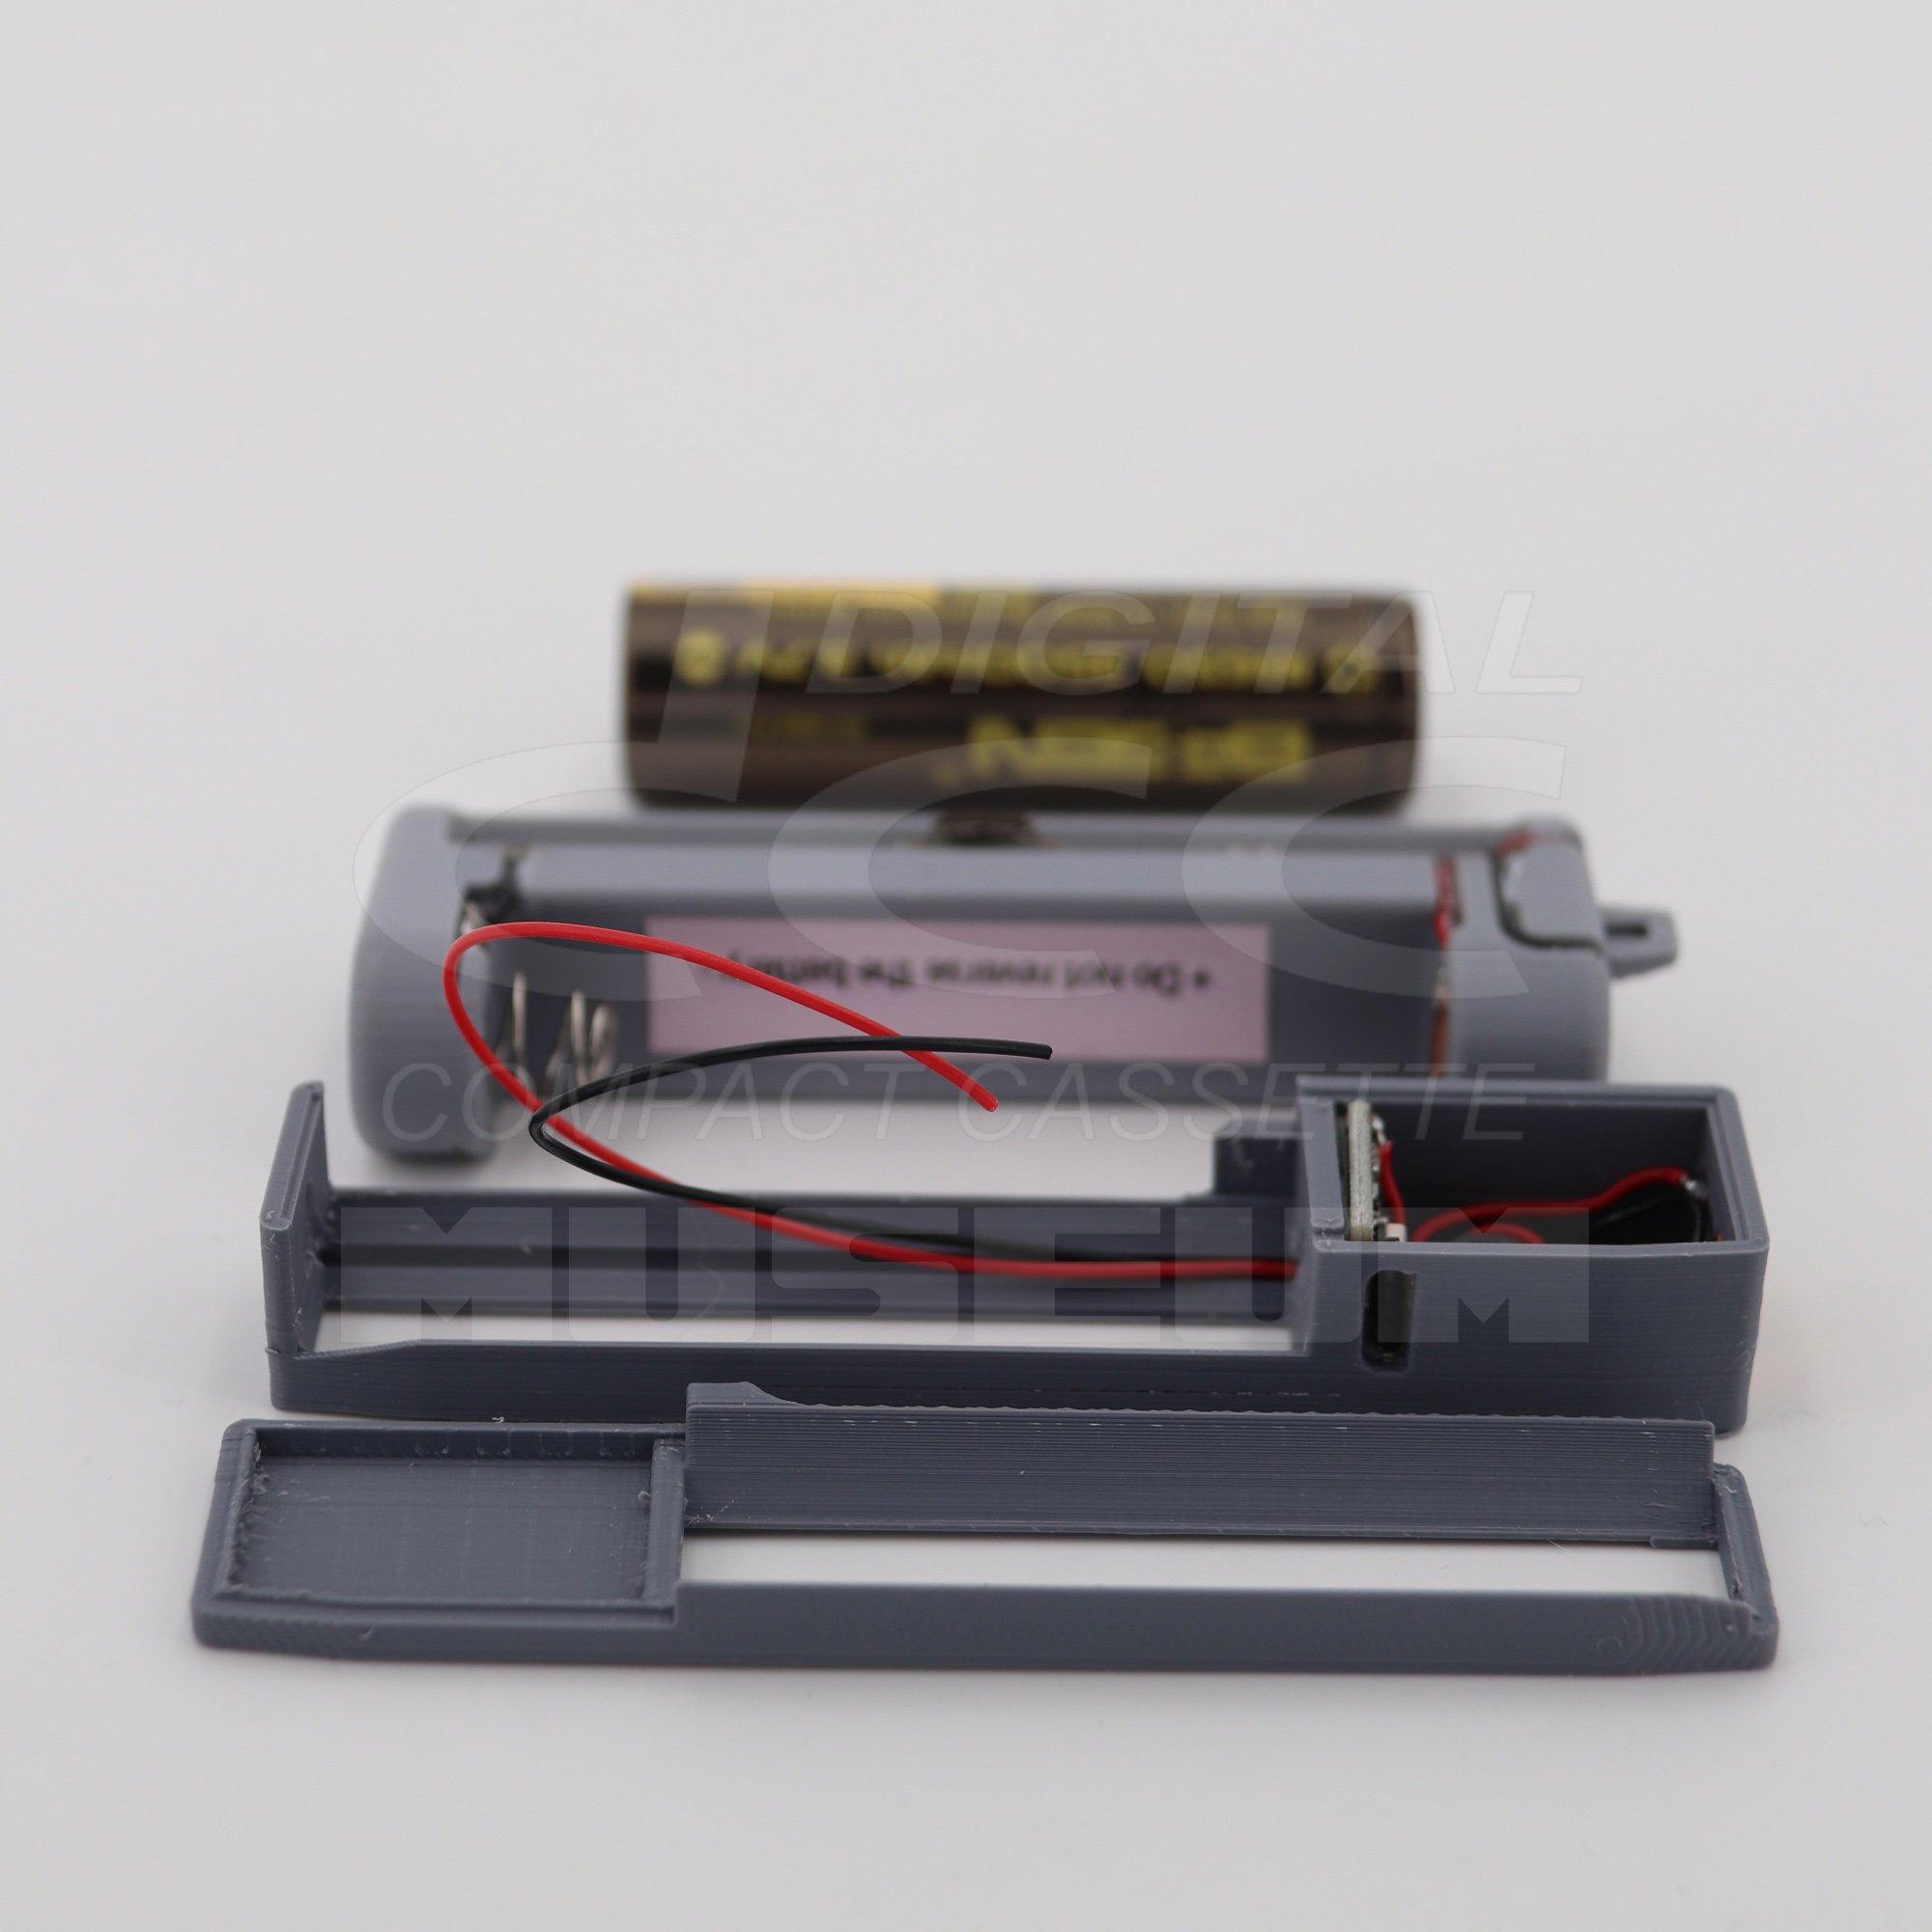 DCC Museum Spare Parts - Battery